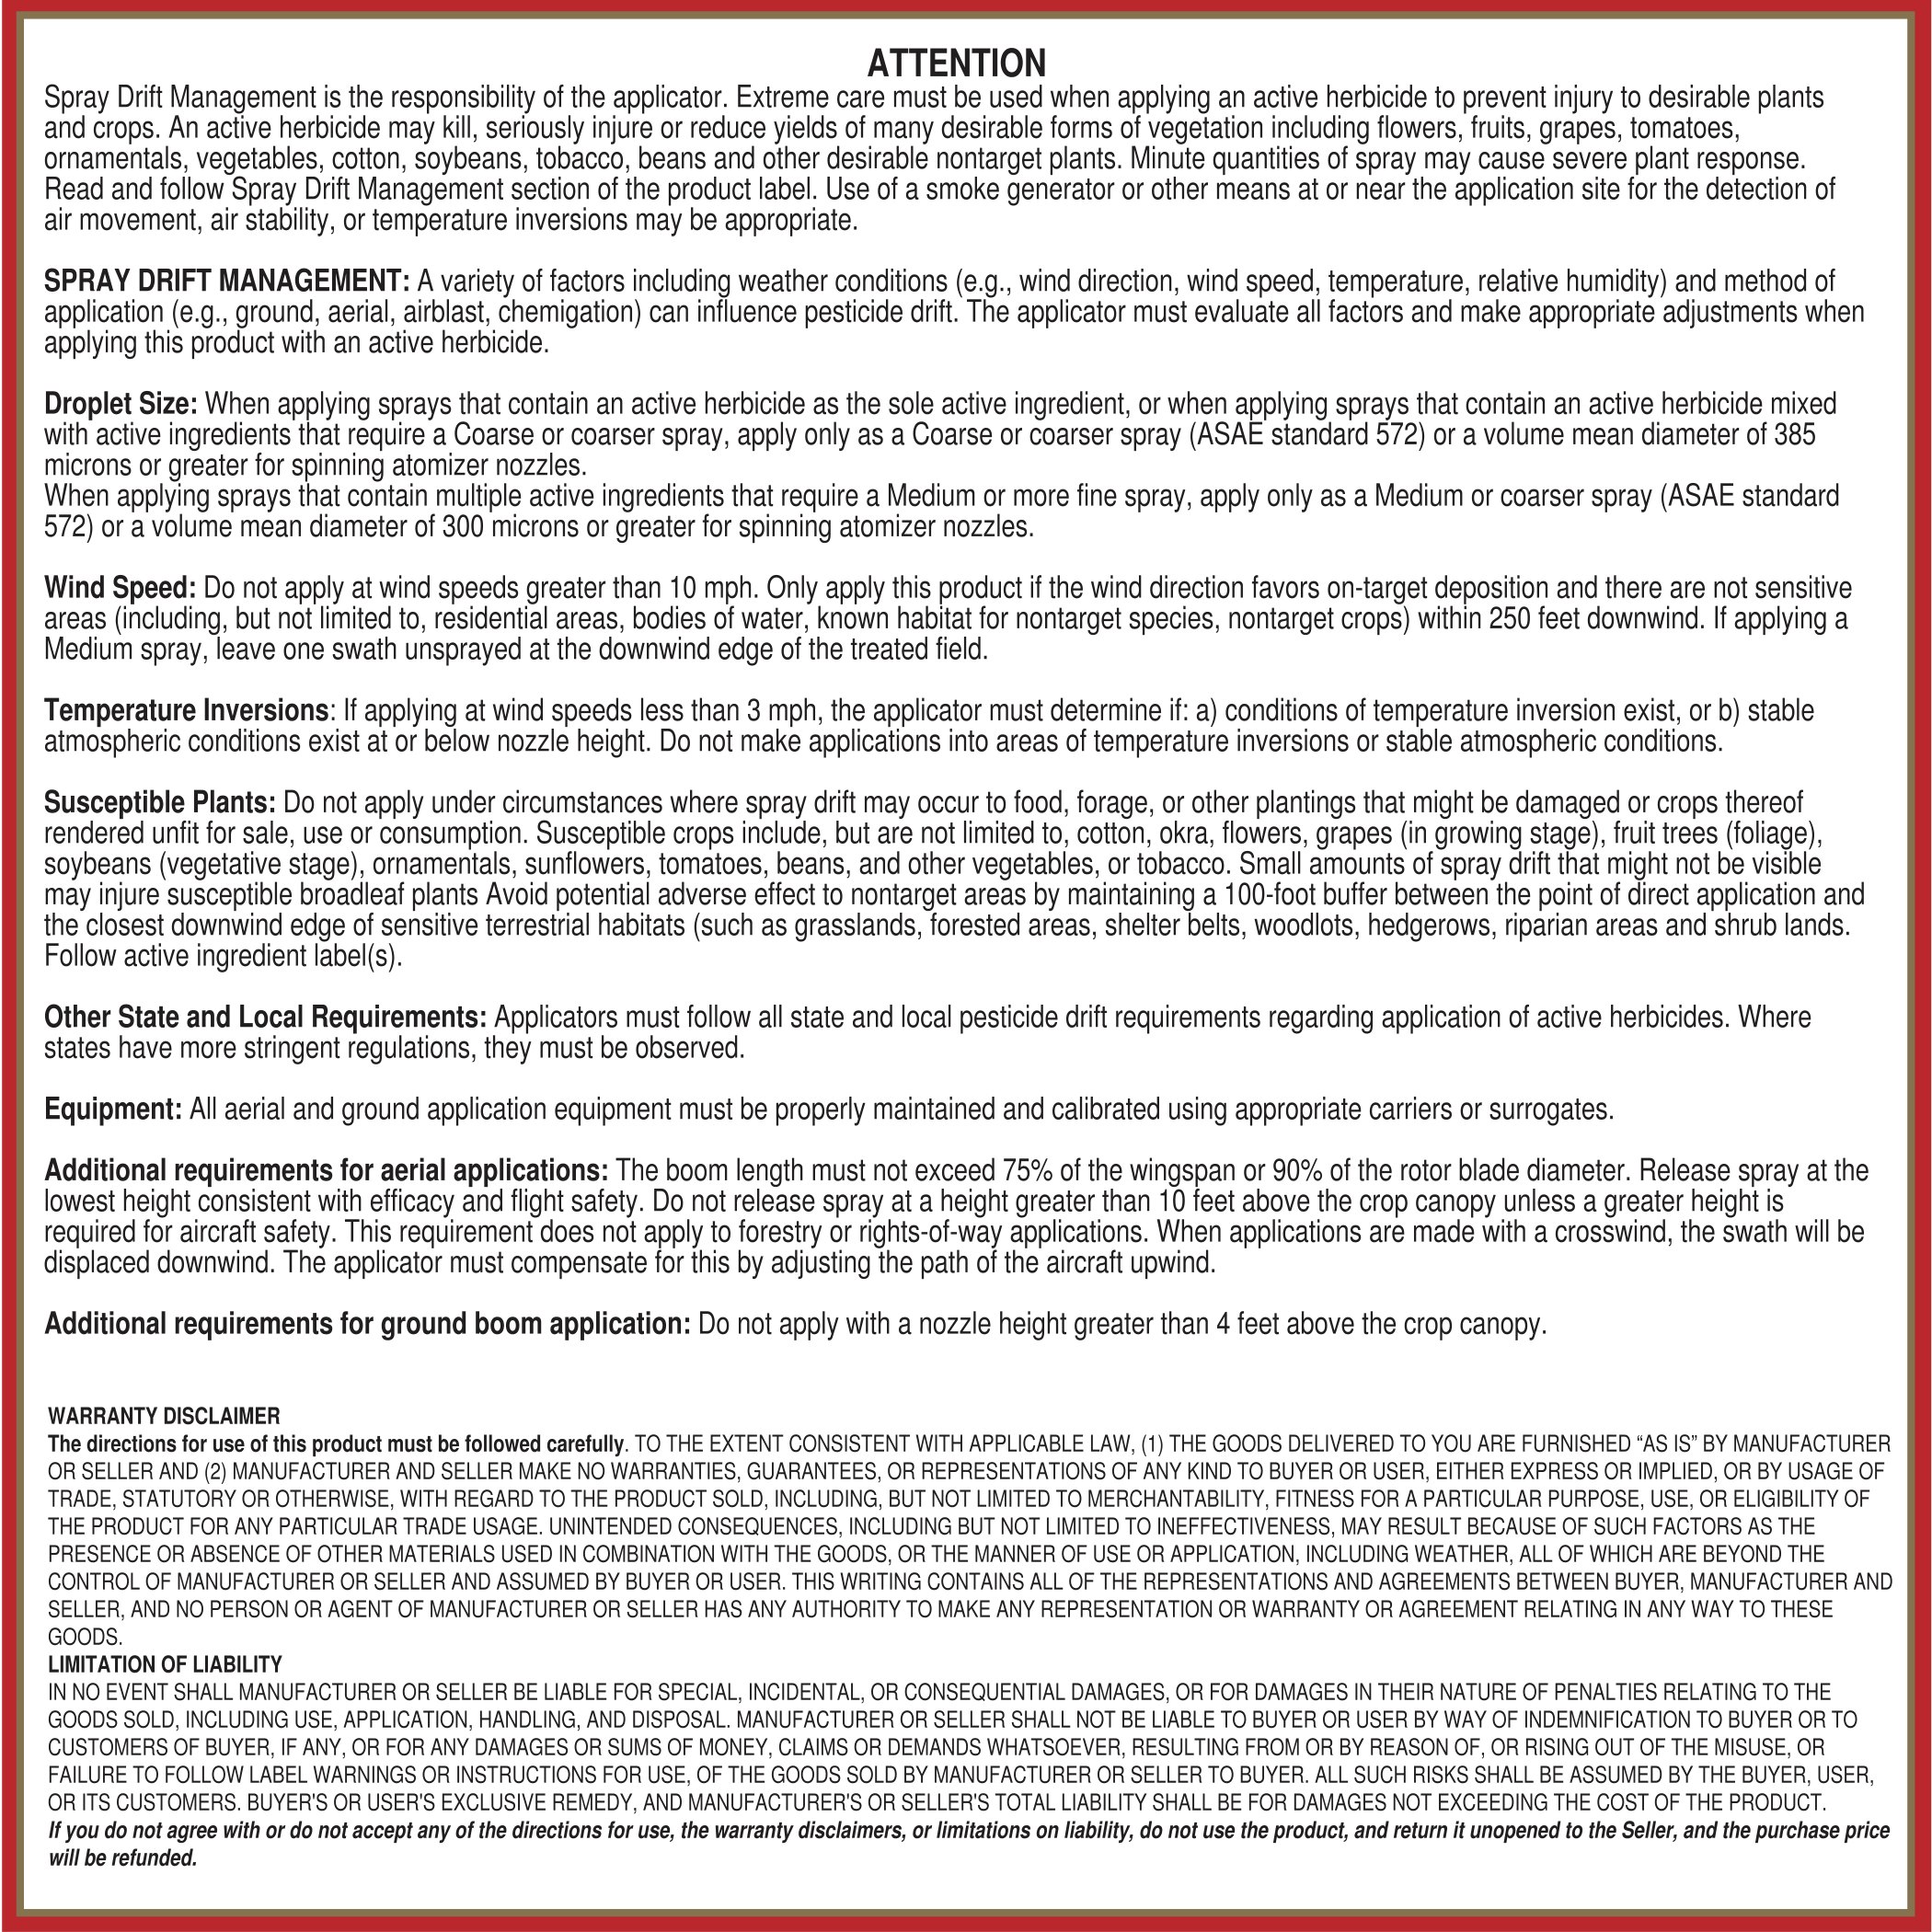 CadoMax label back 8-1-16-2.jpg